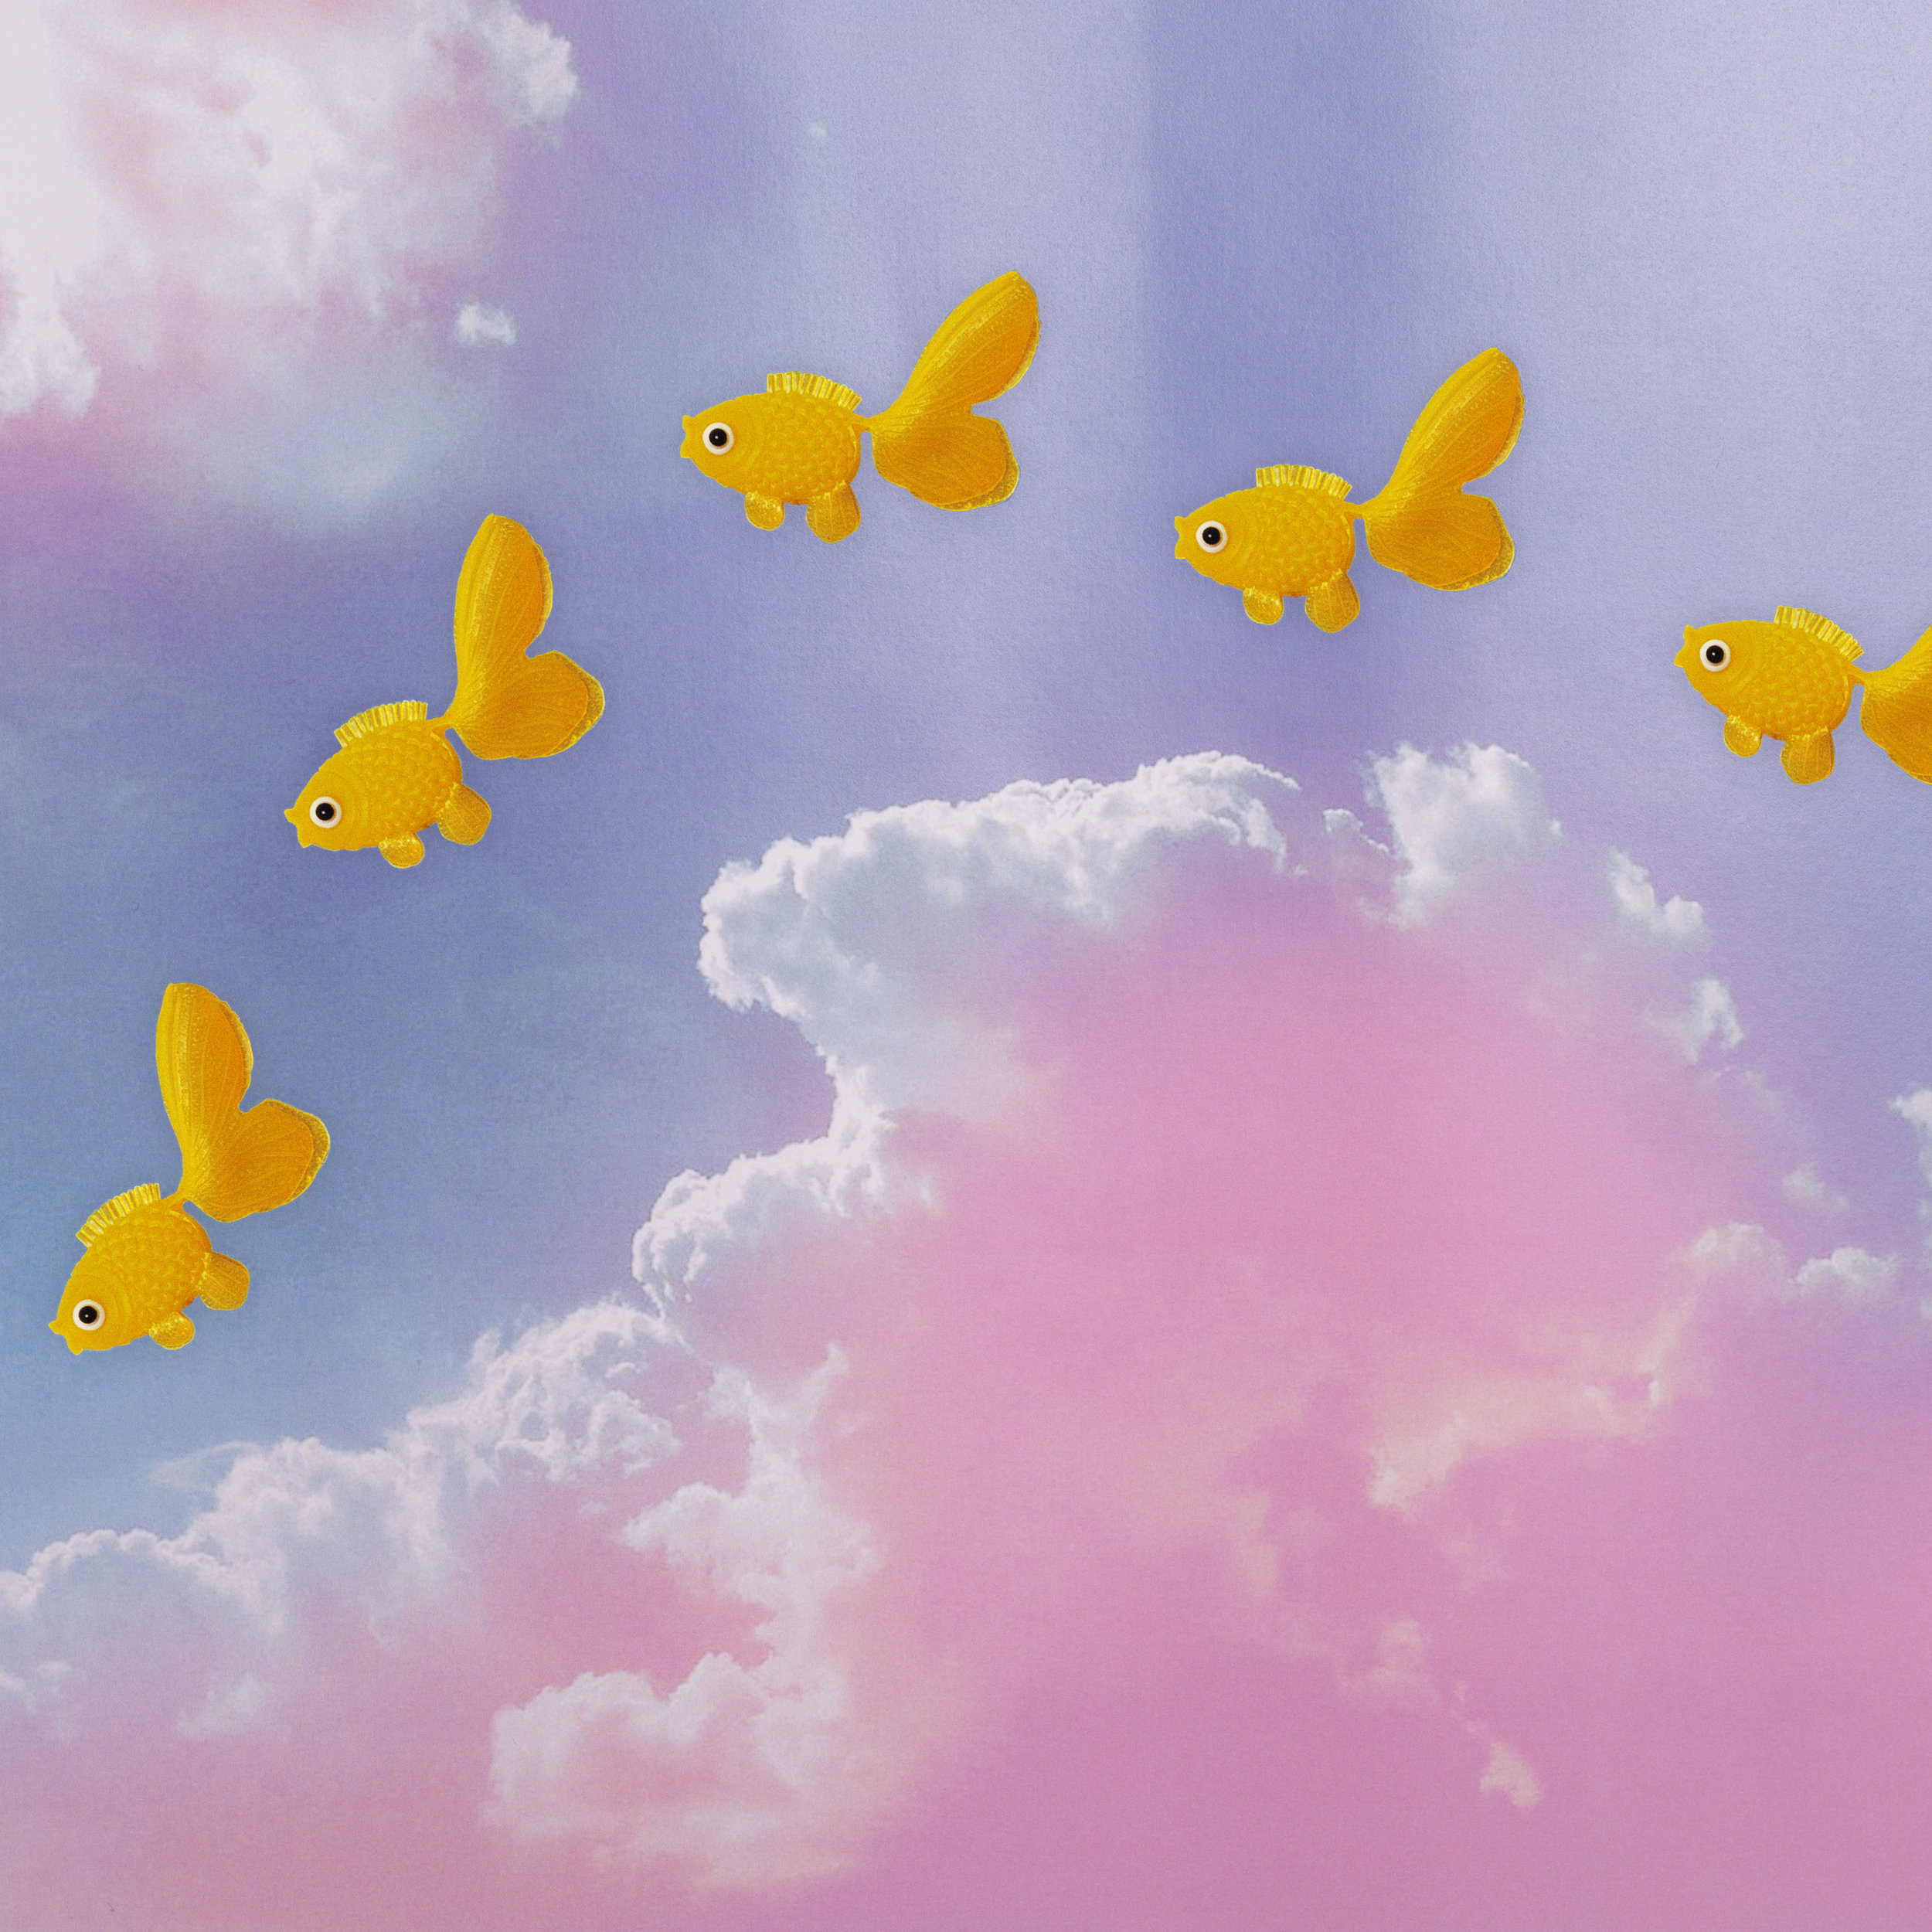 April 21st - World Fish Migration Day